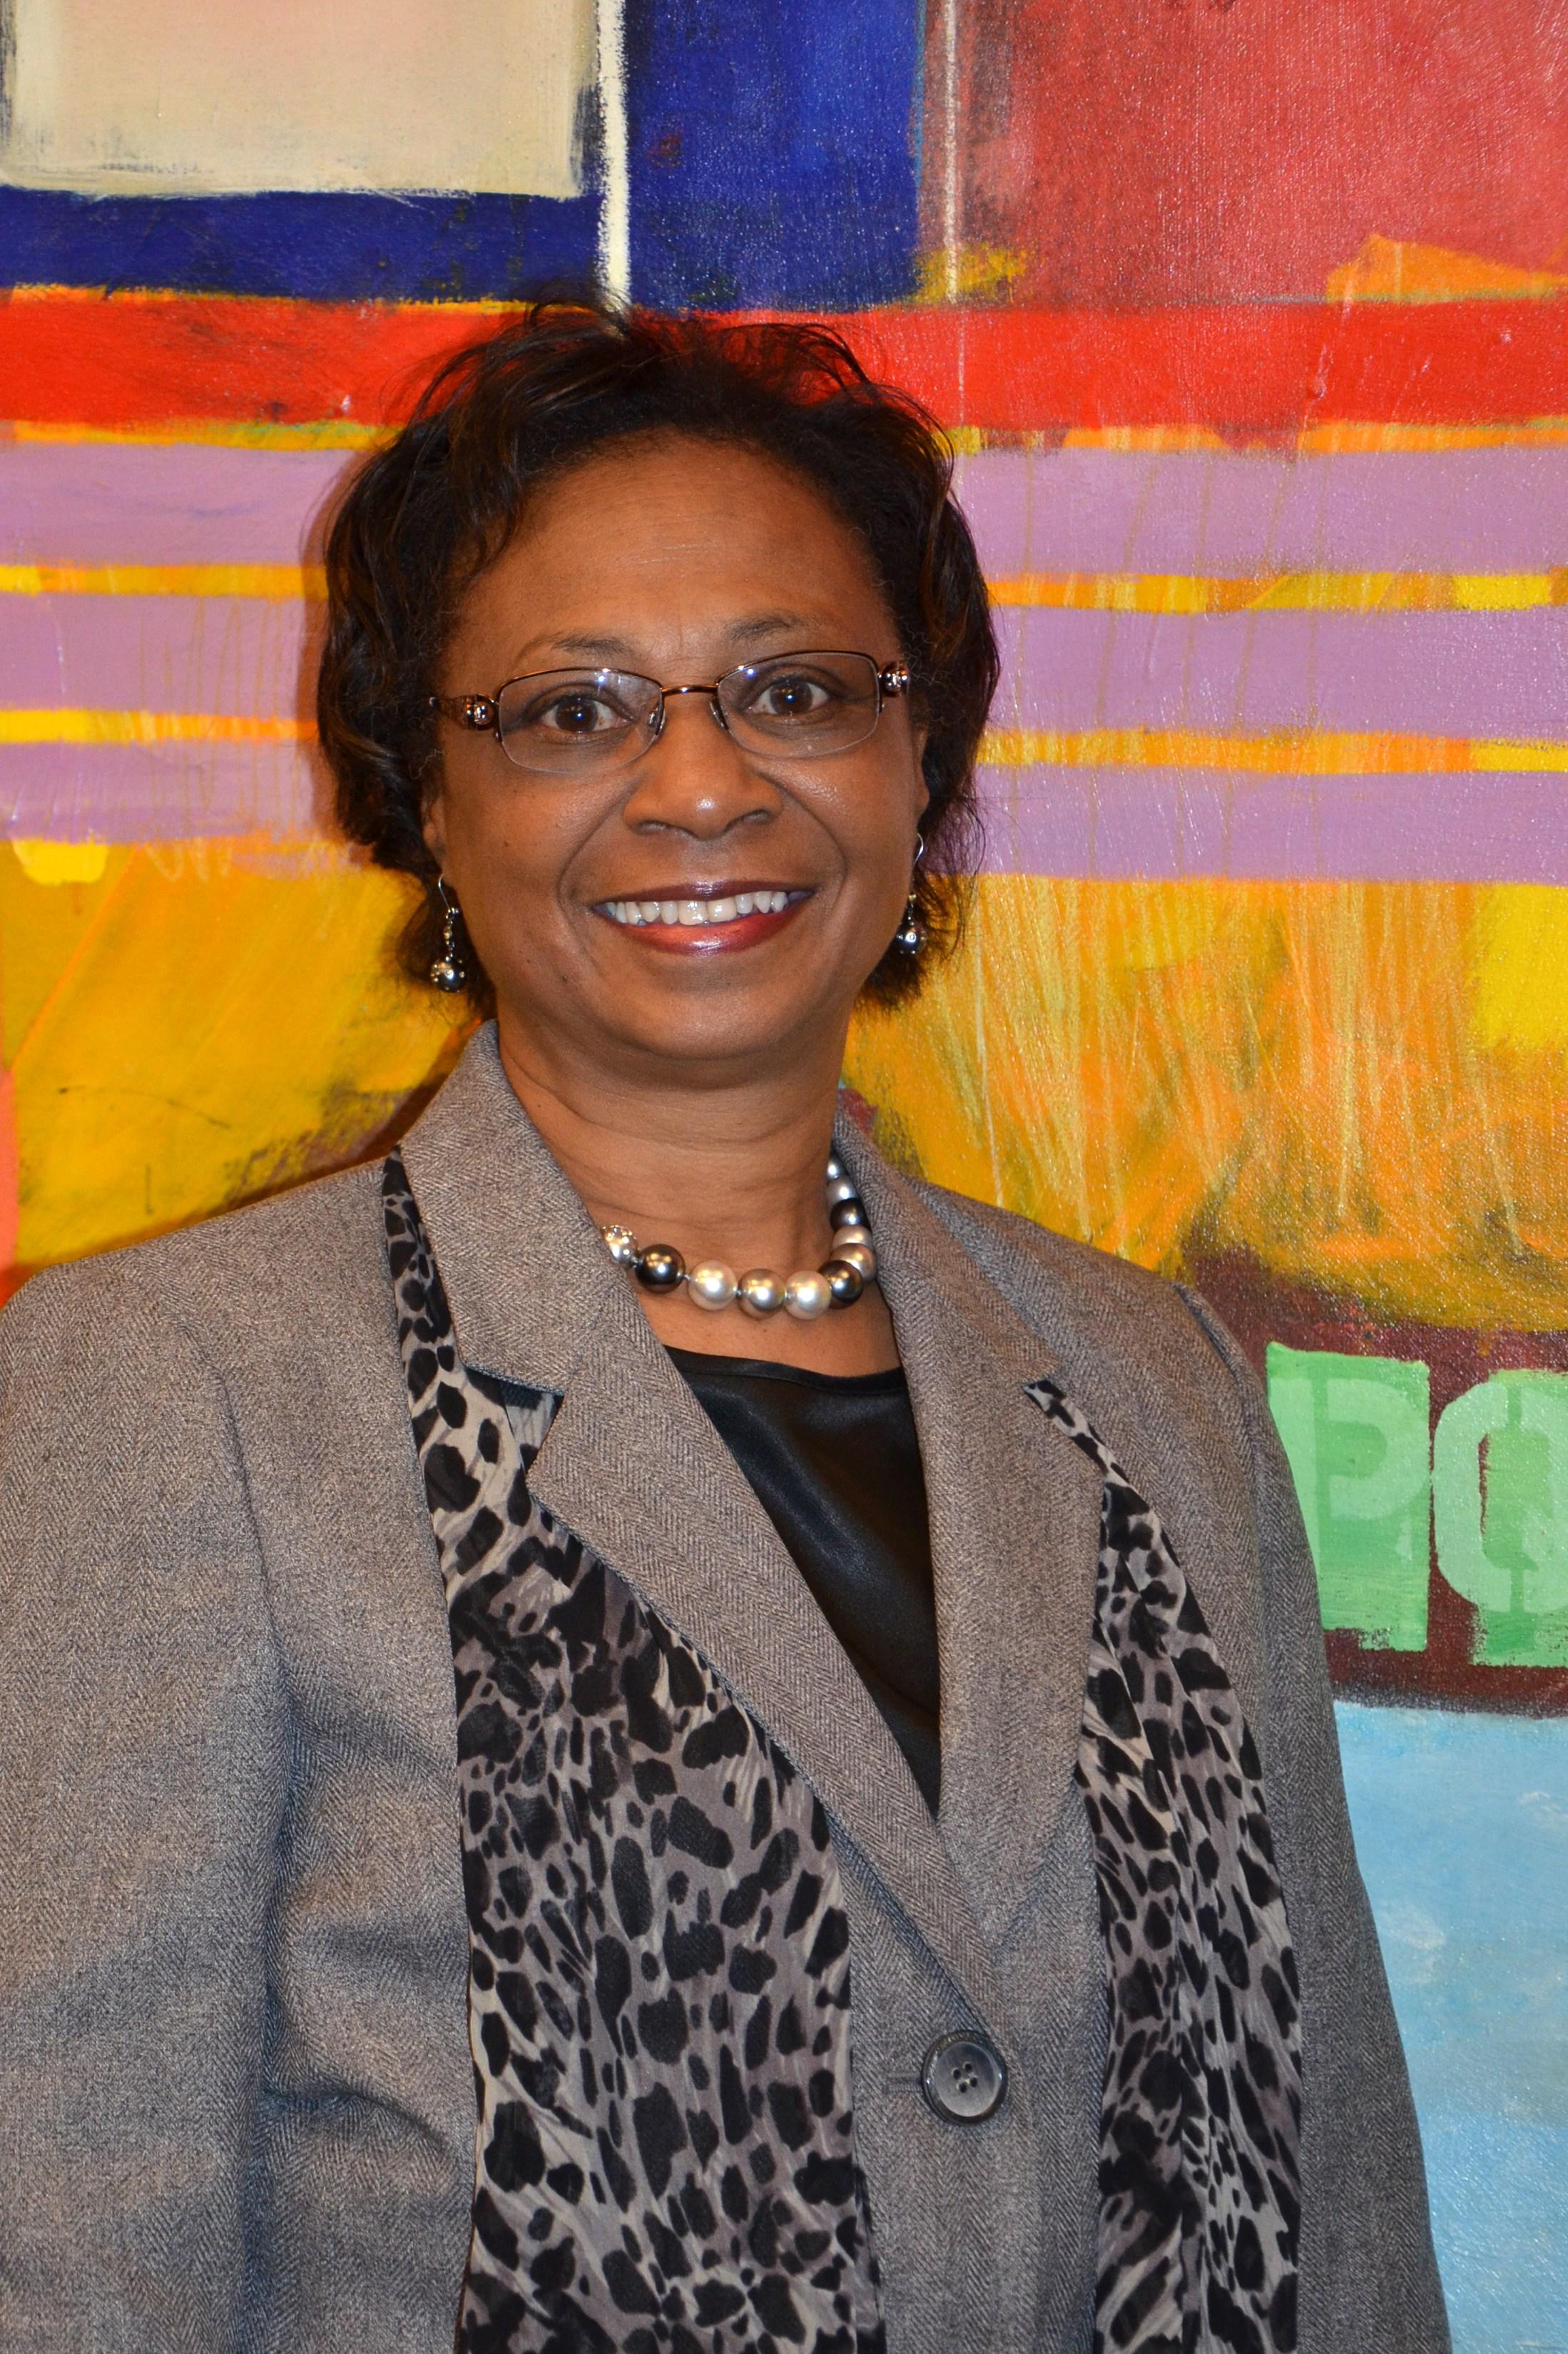 Jackie Payton, Board member